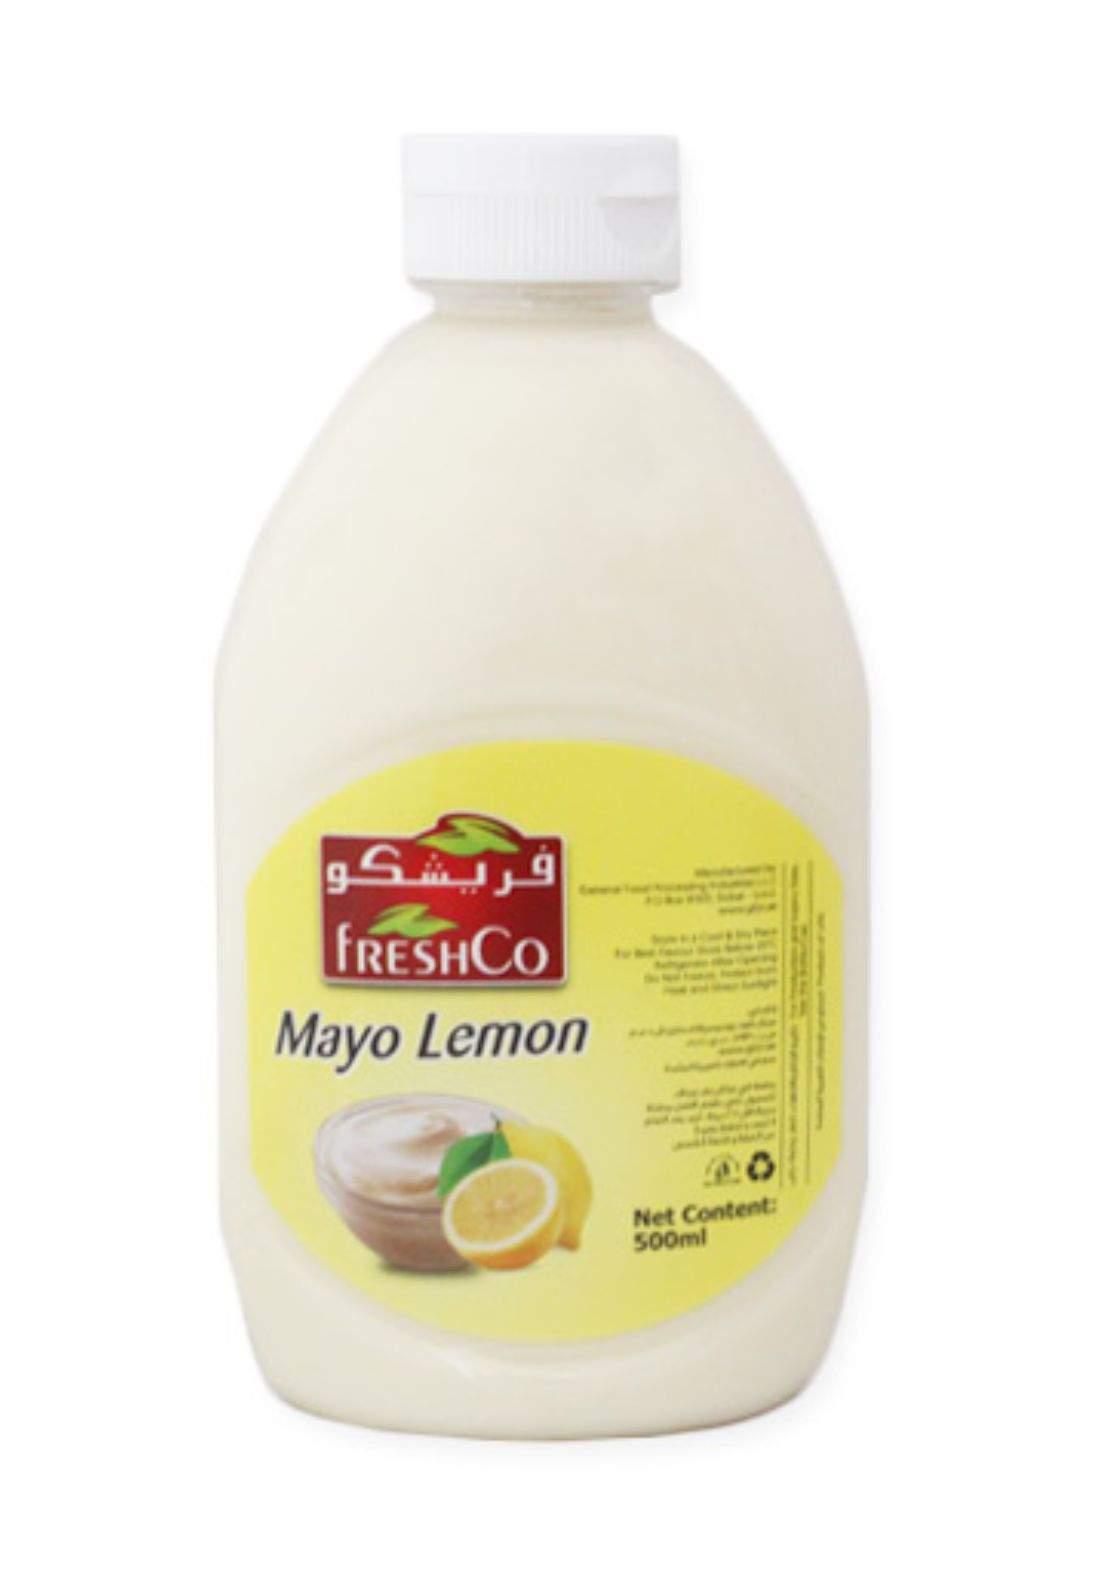 FreshCo Mayonnaise with Lemon فريشكو مايونيز بالليمون